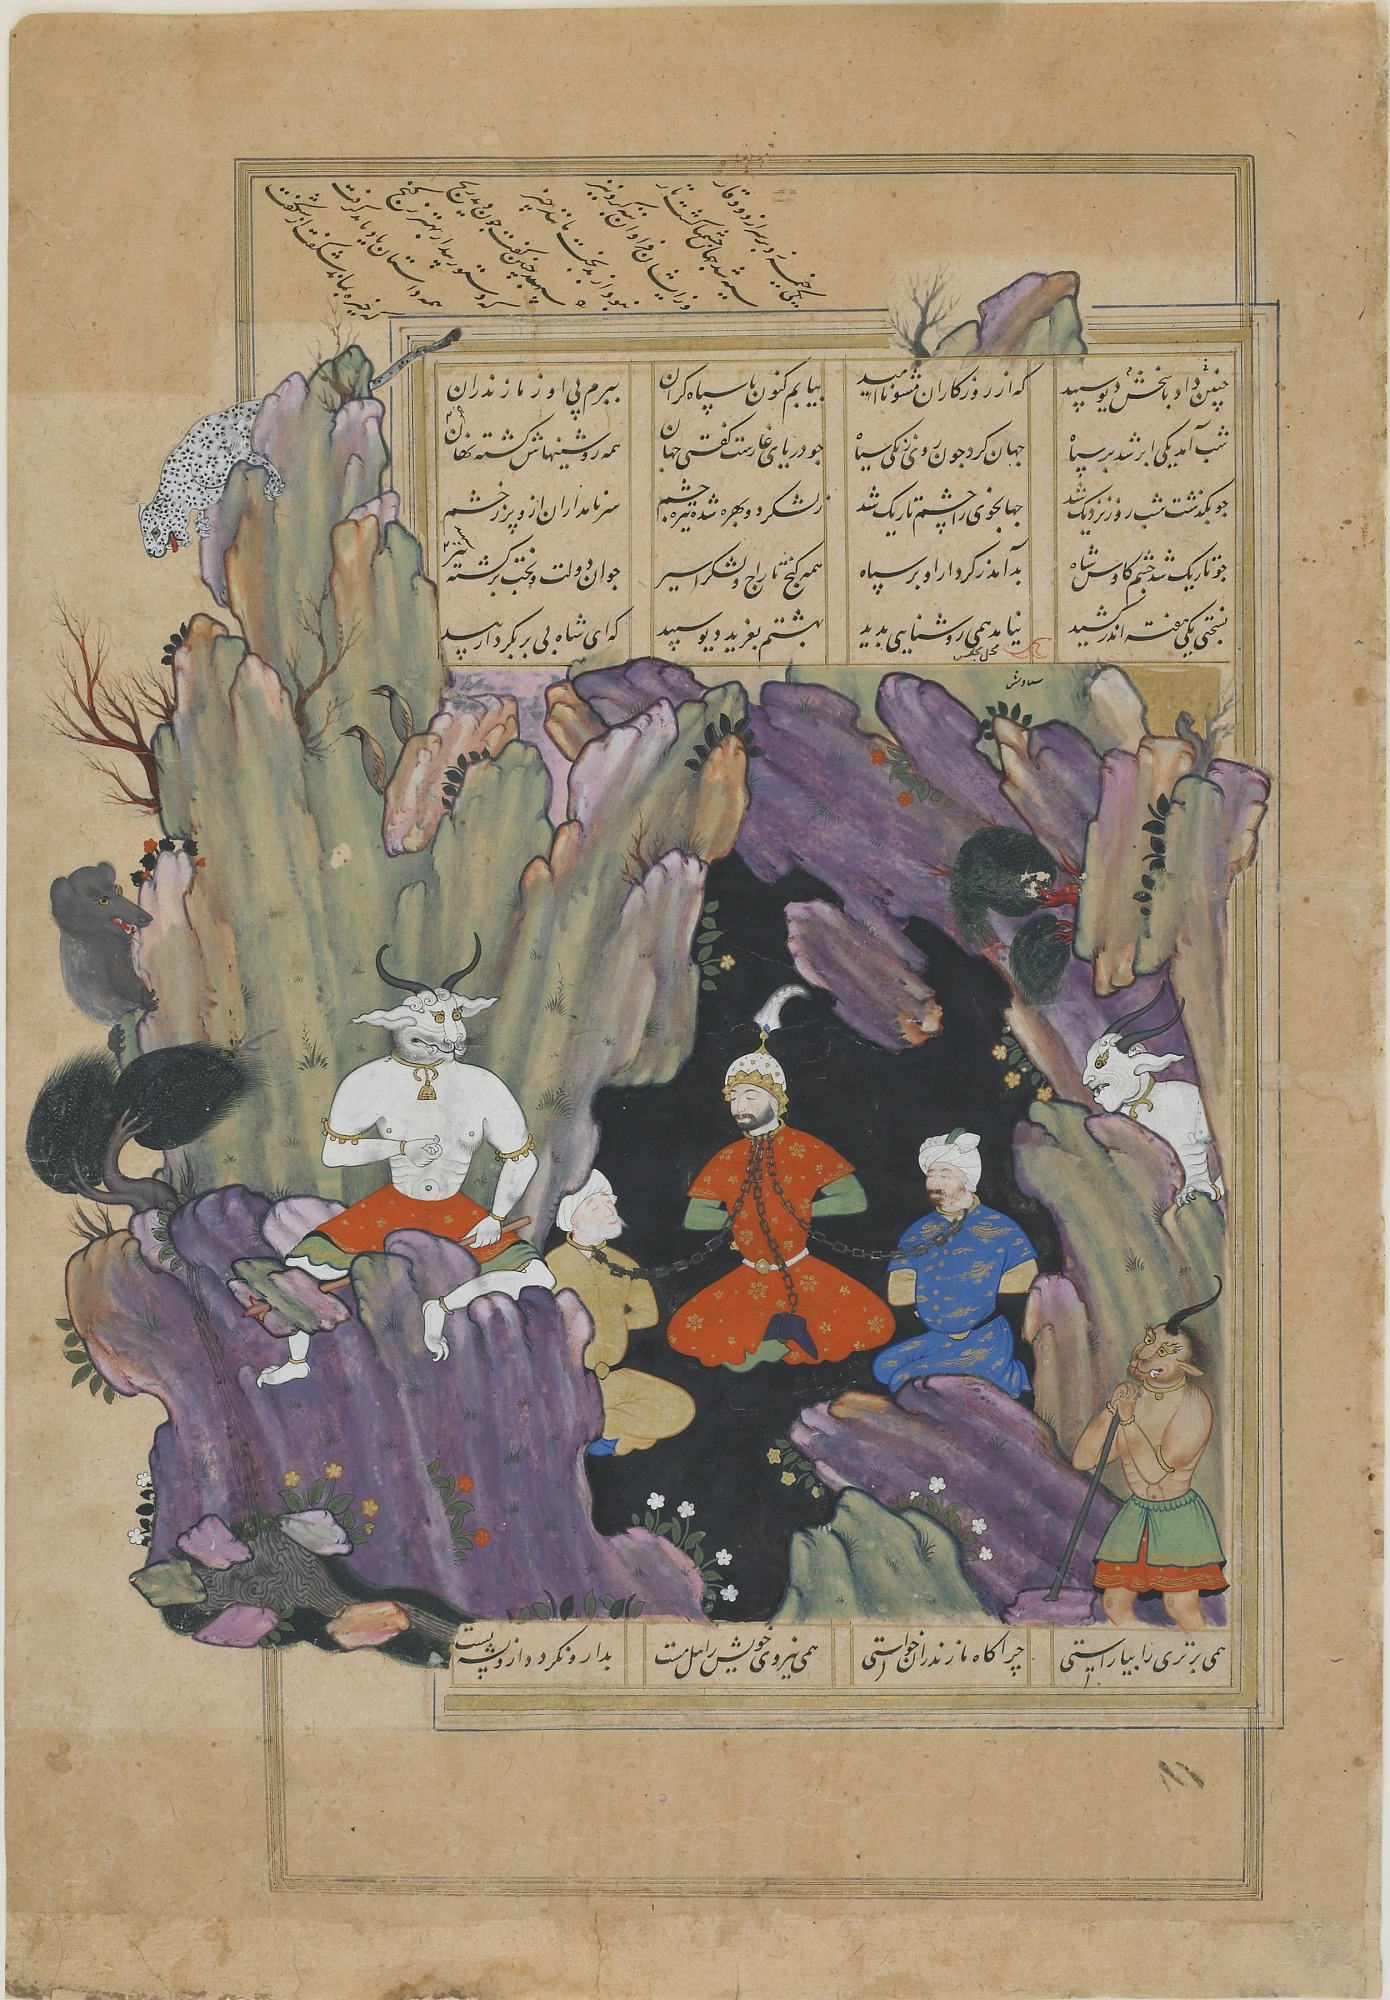 Folio from a Shahnama (Book of kings) by Firdawsi (d. 1020); recto: Kay Ka